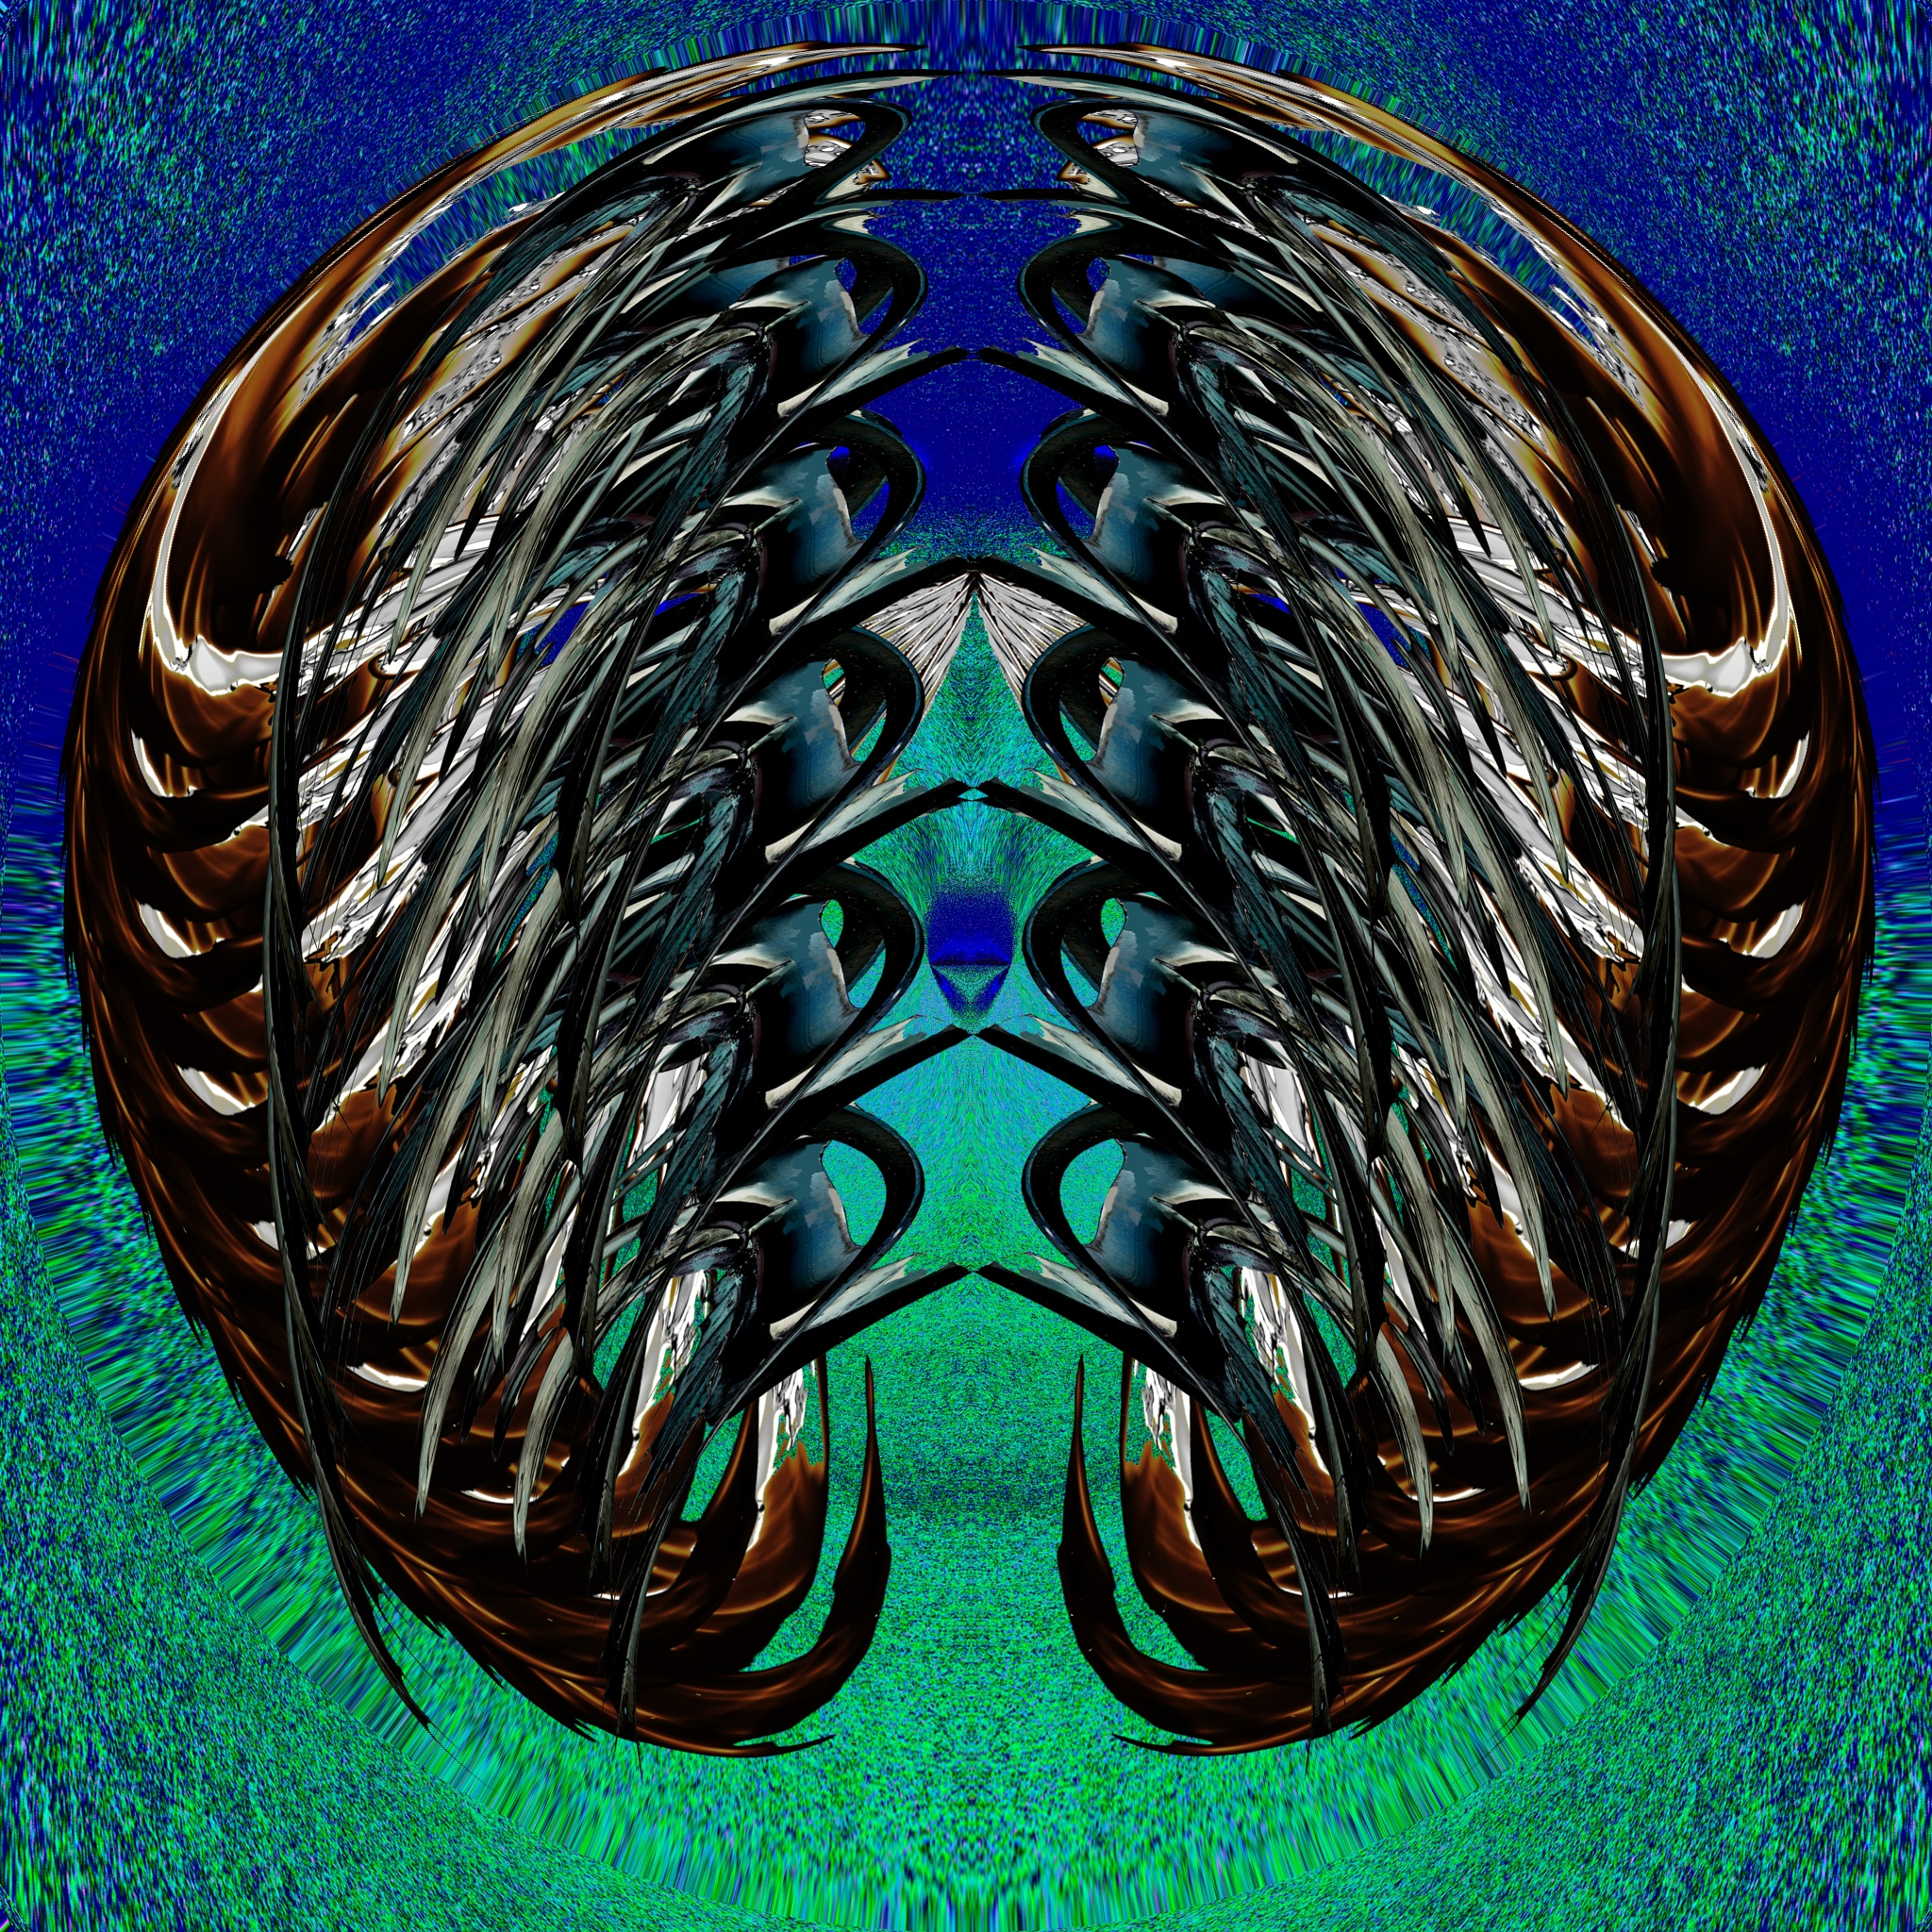 Blugreenwings by pete.moyes.7